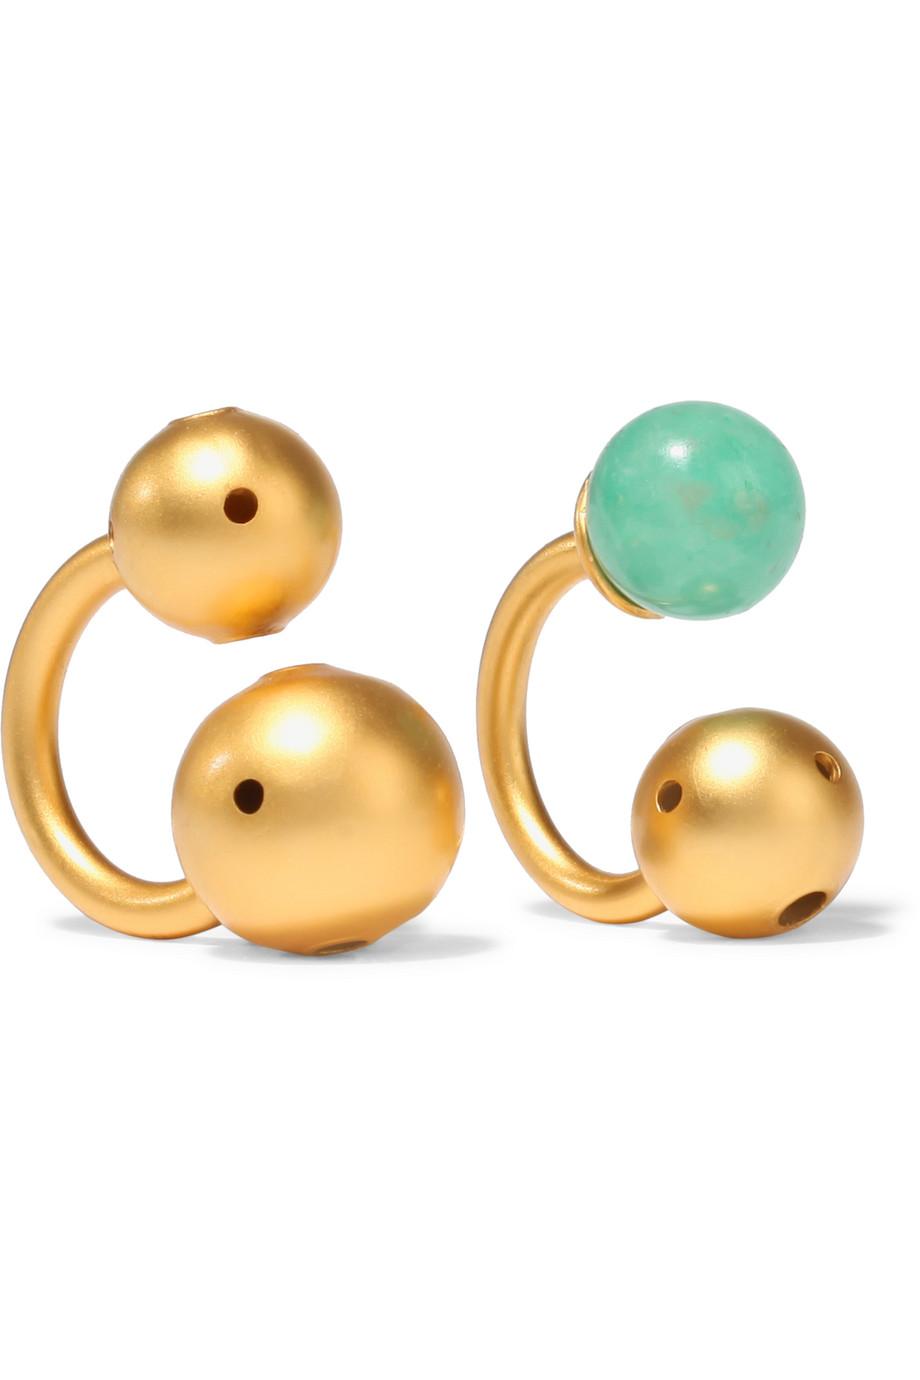 Paula Mendoza Pierce Set of Two Gold-Plated Cabochon Ear Cuffs, Gold/Turquoise, Women's